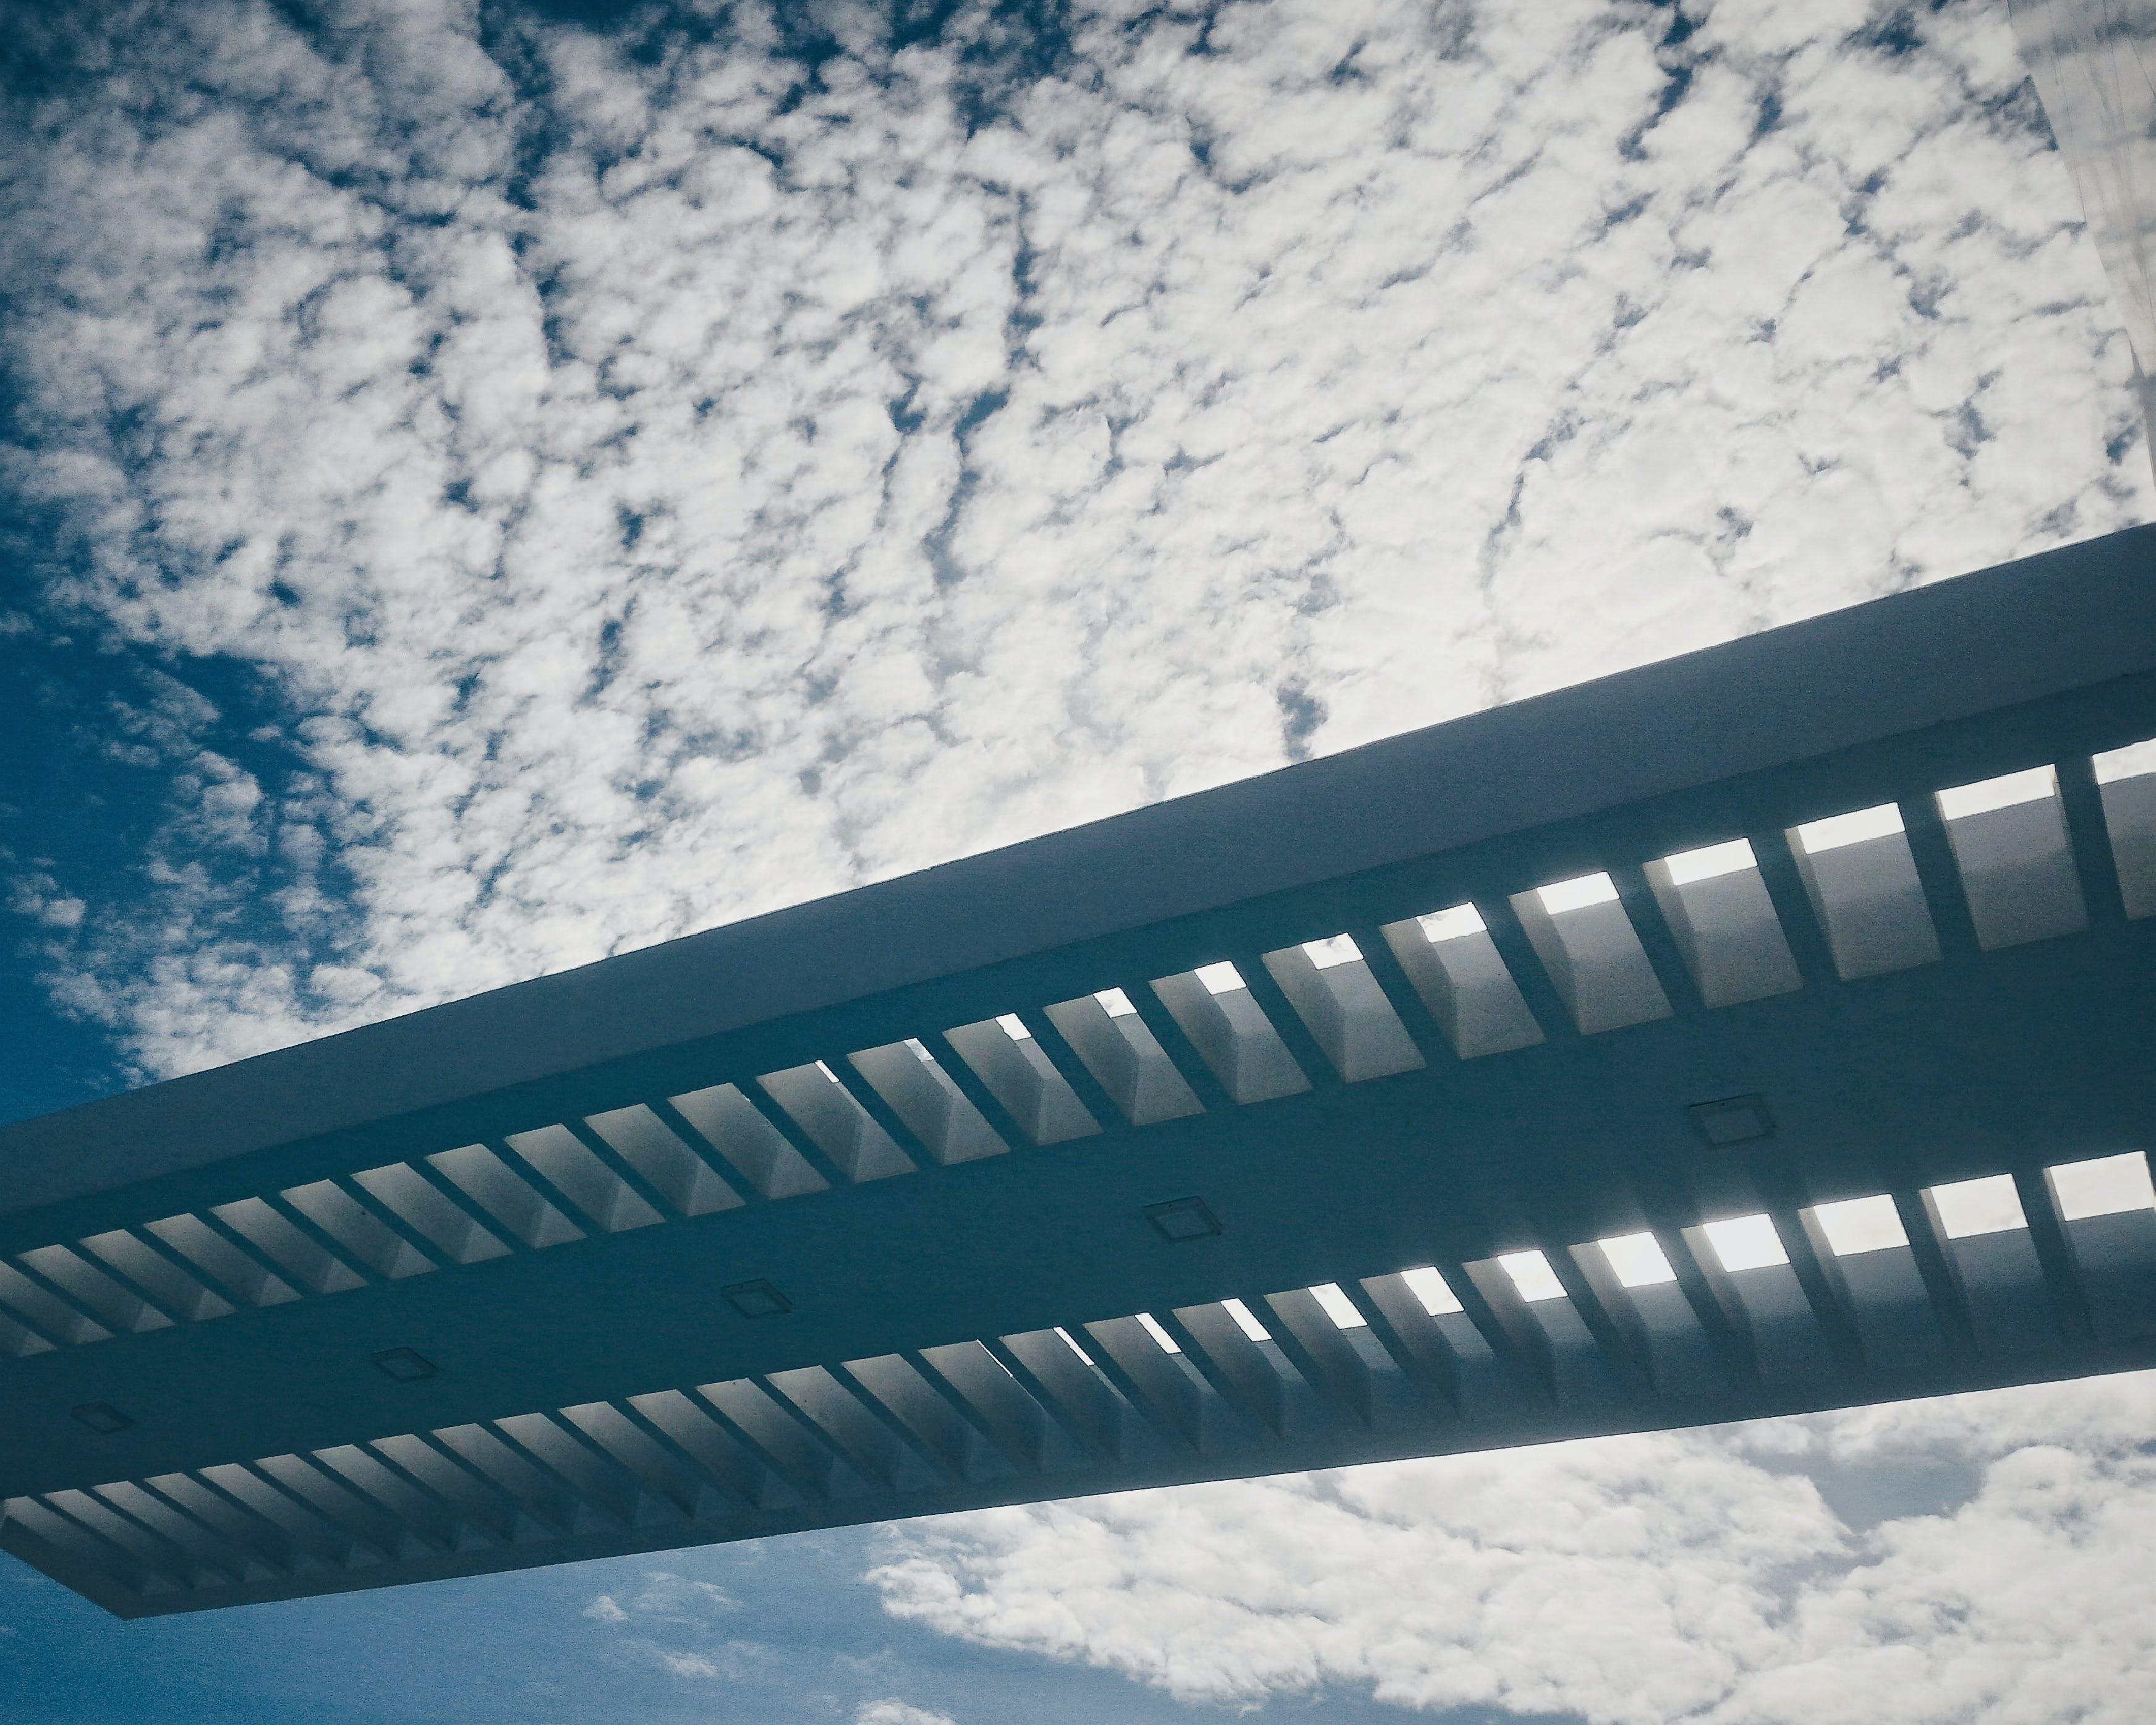 Silhouette of Bridge Under Cloudy Sky